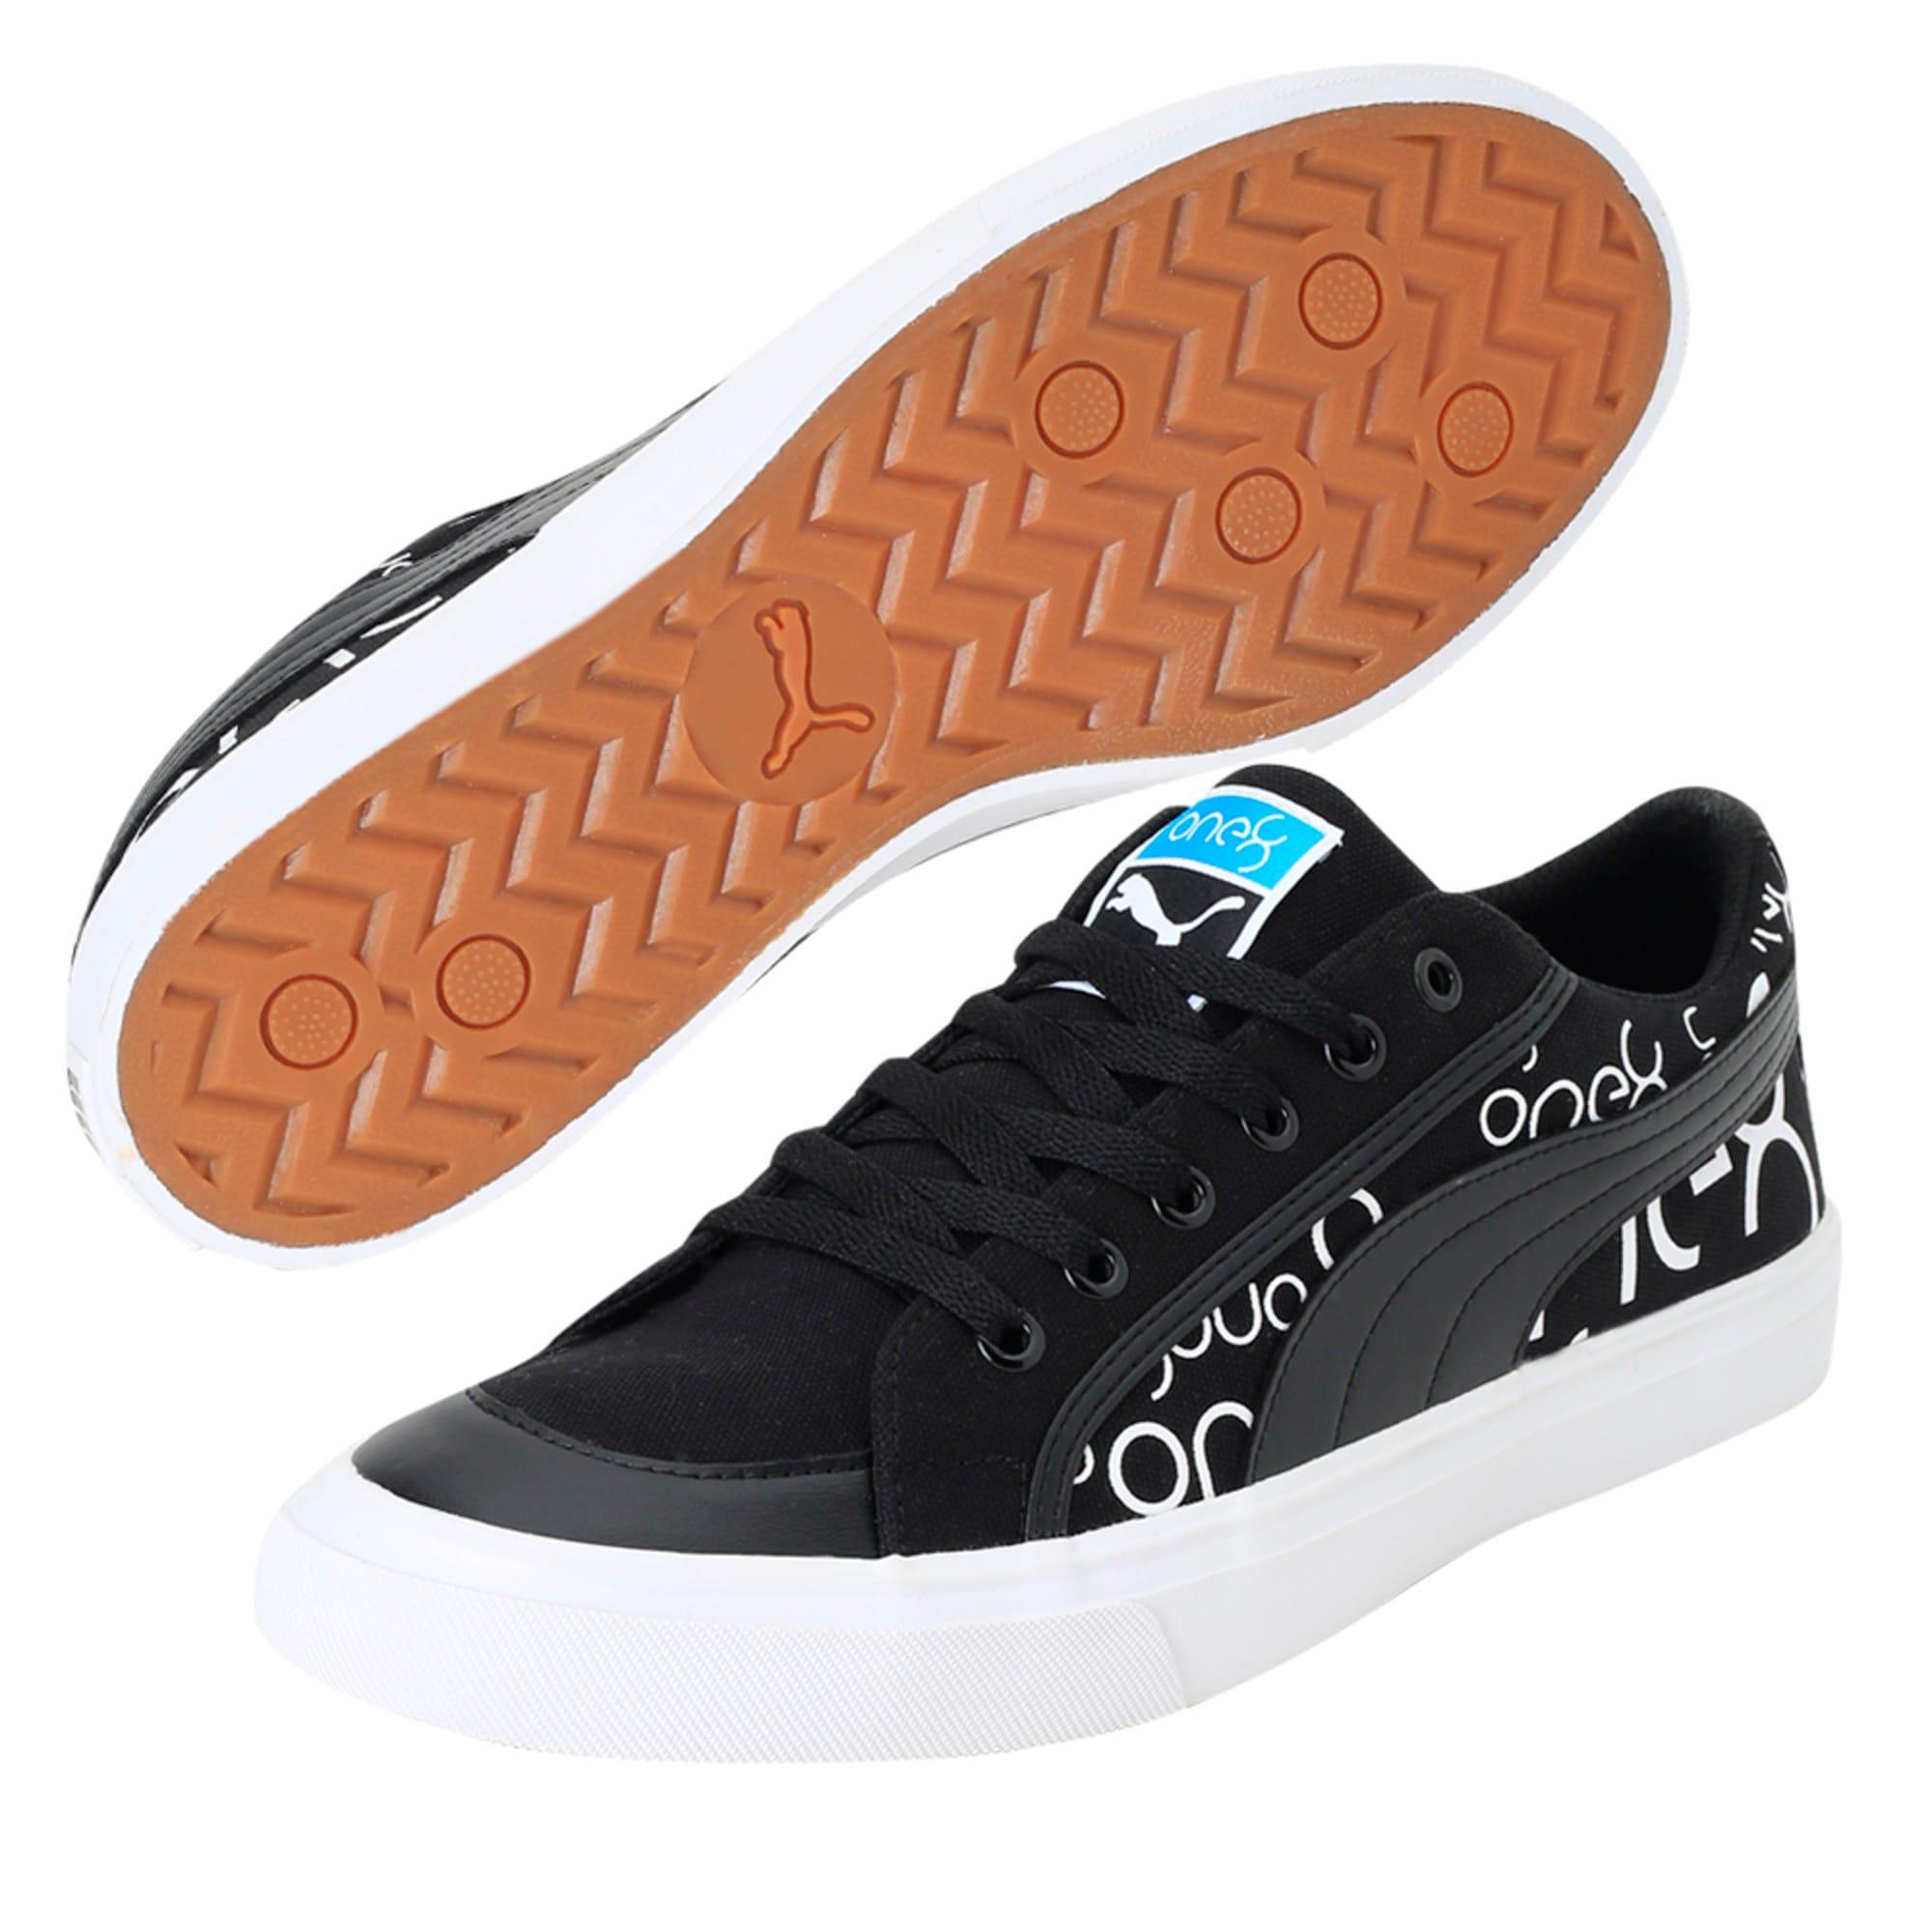 Thumbnail 5 of one8 Men's Sneakers, Black-White-Pomegranate, medium-IND